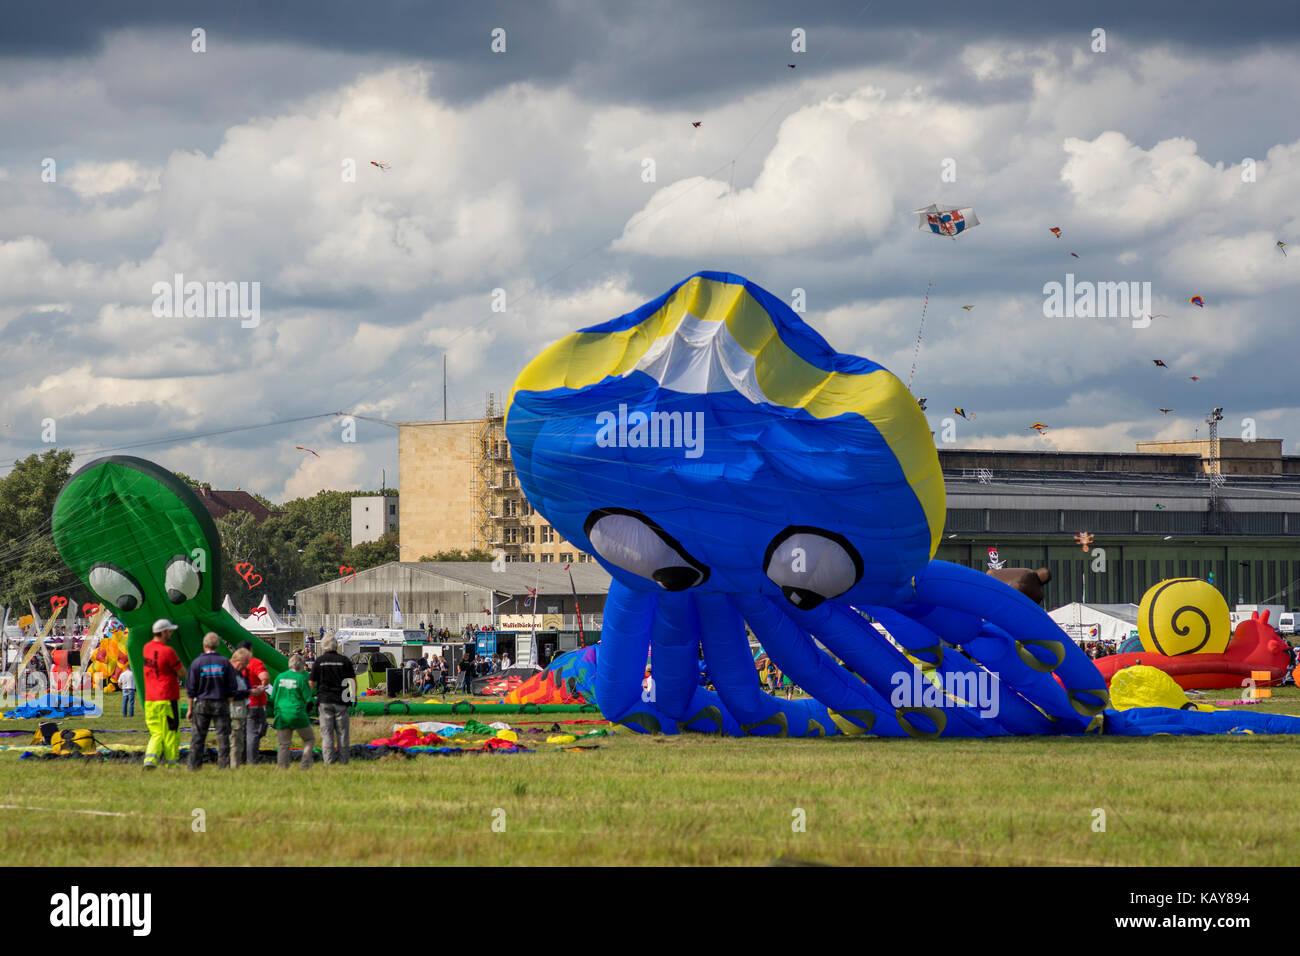 Kite festival at Tempelhofer Feld in Berlin, Germany 2017. Stock Photo